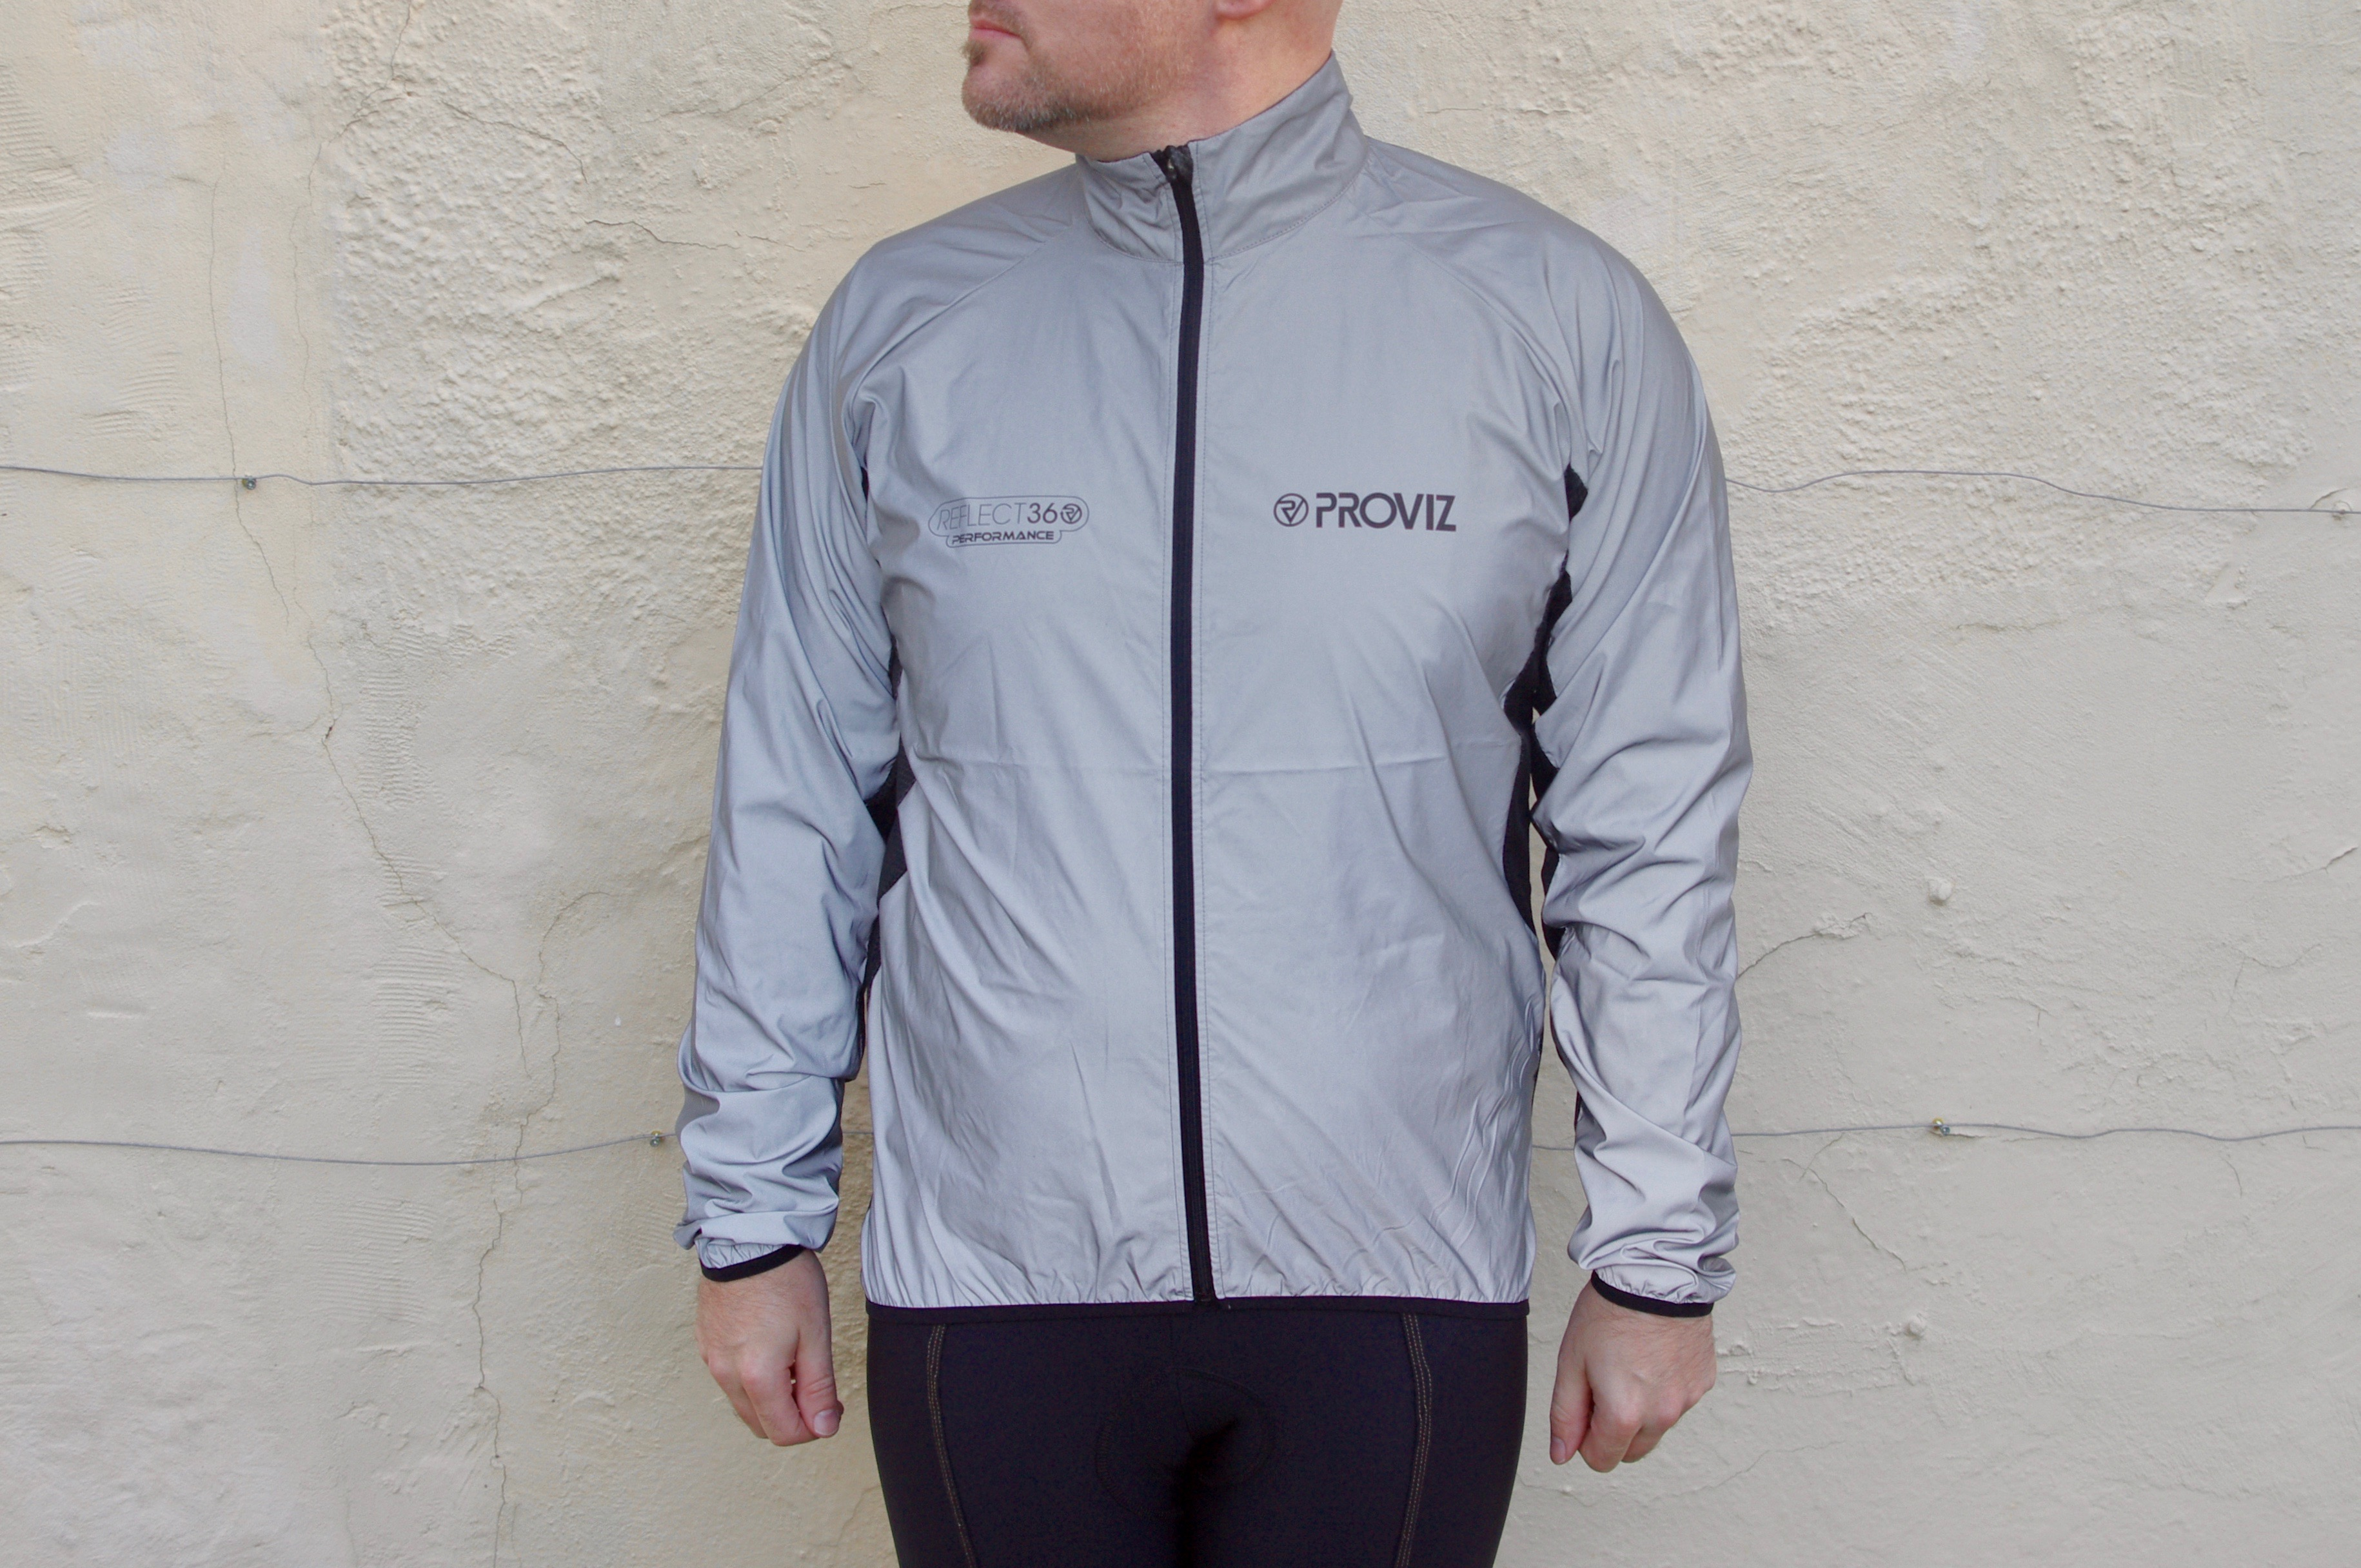 REFLECT 360 Proviz Reflective Men/'s Cycling Jacket